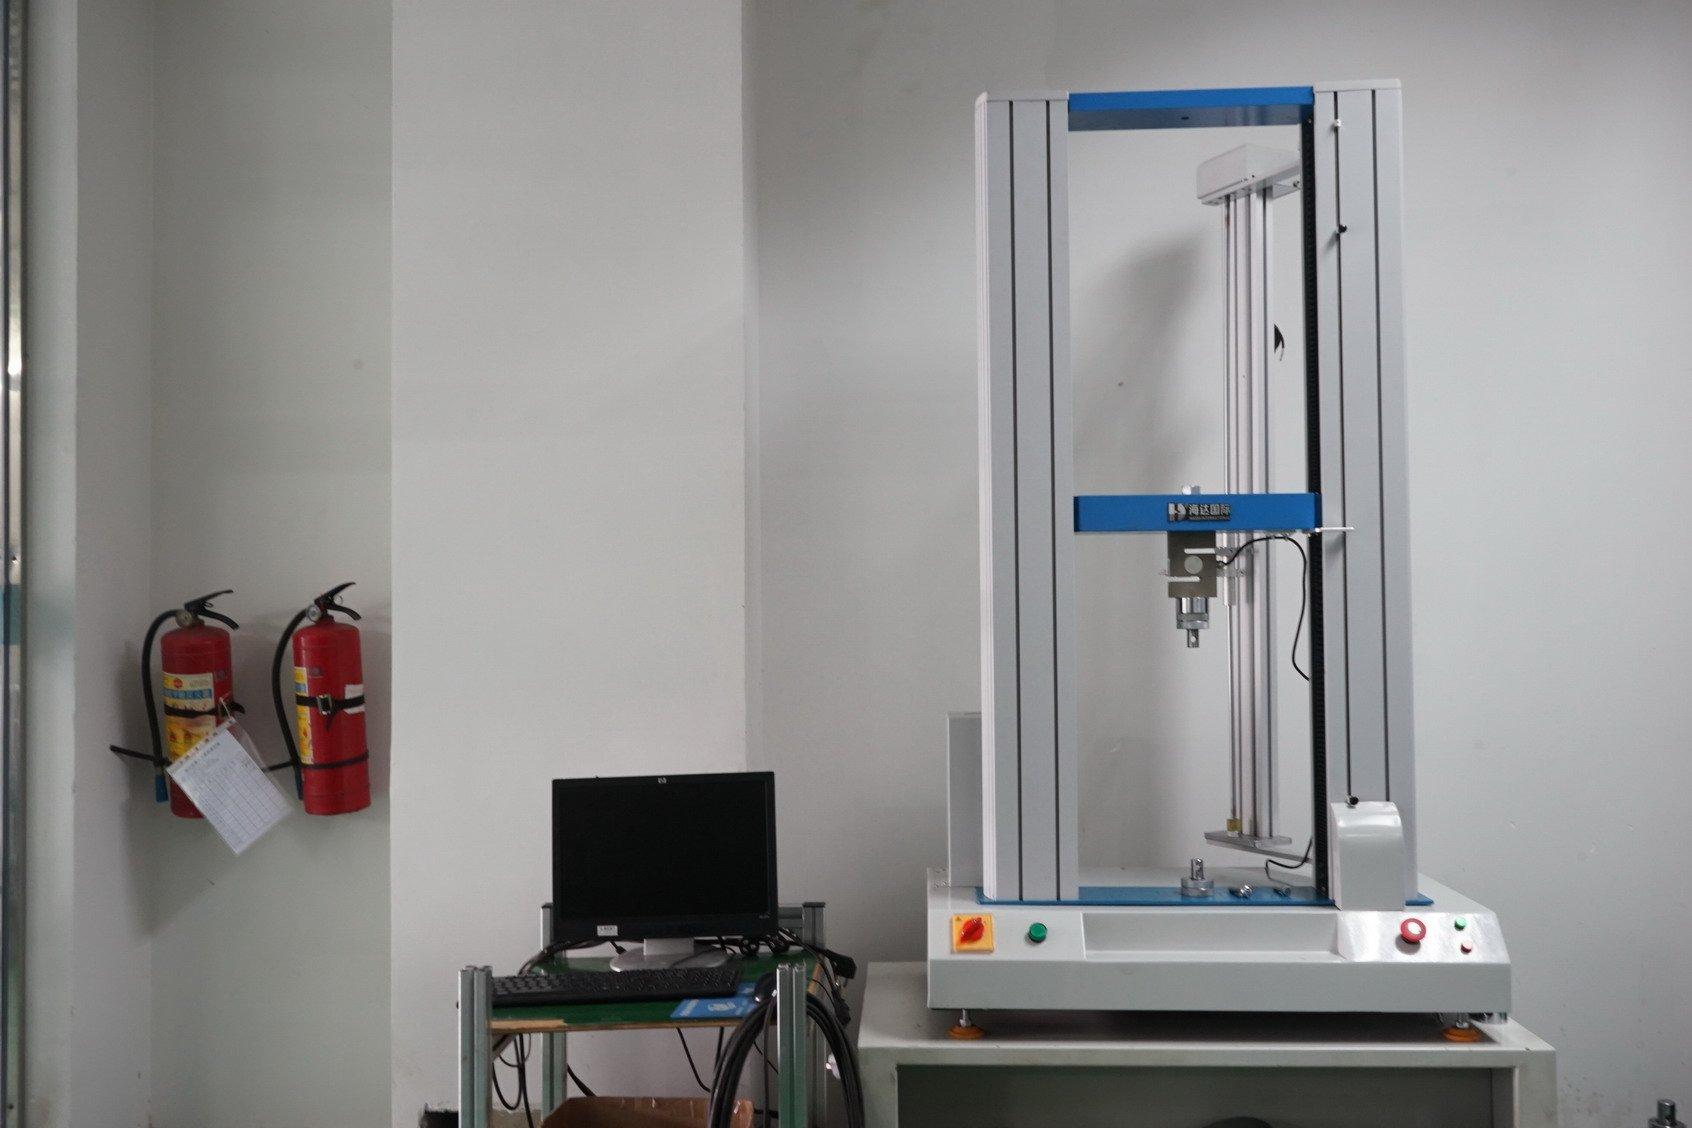 ASTM Servo Tensile Testing Equipment